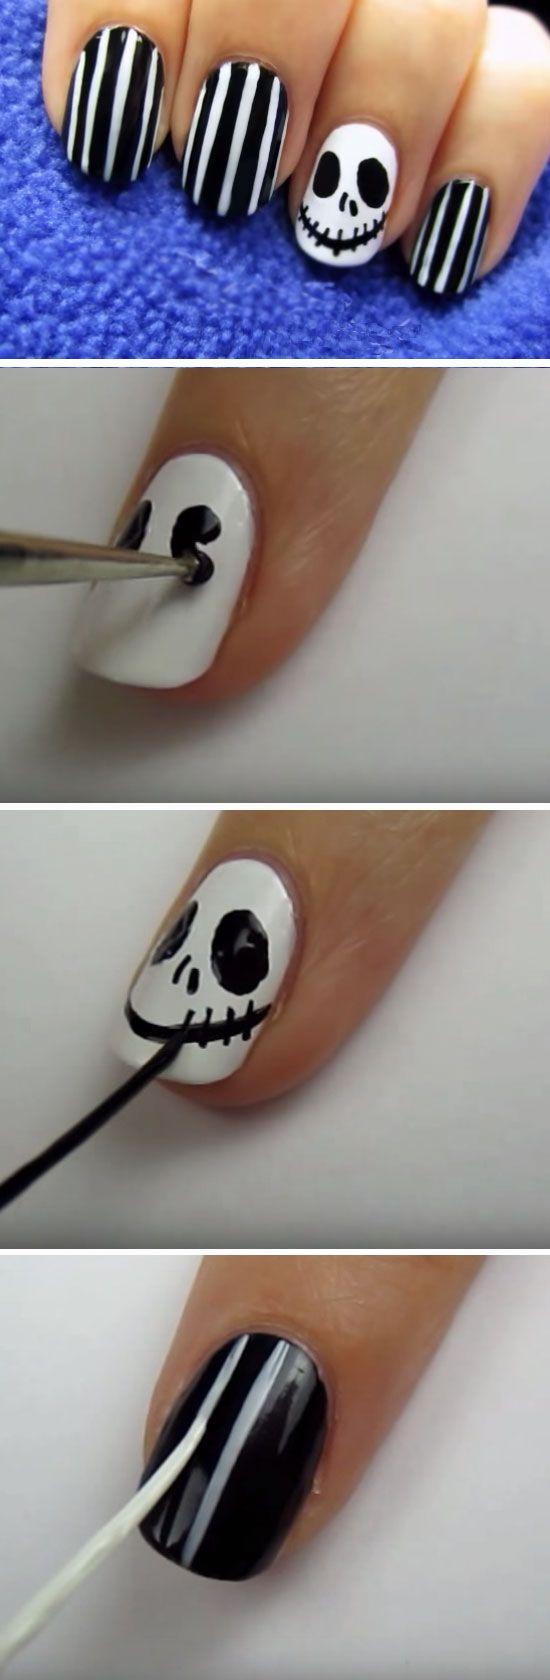 Jack Skellington | 20 + Spooky Nail Art Ideas for Halloween